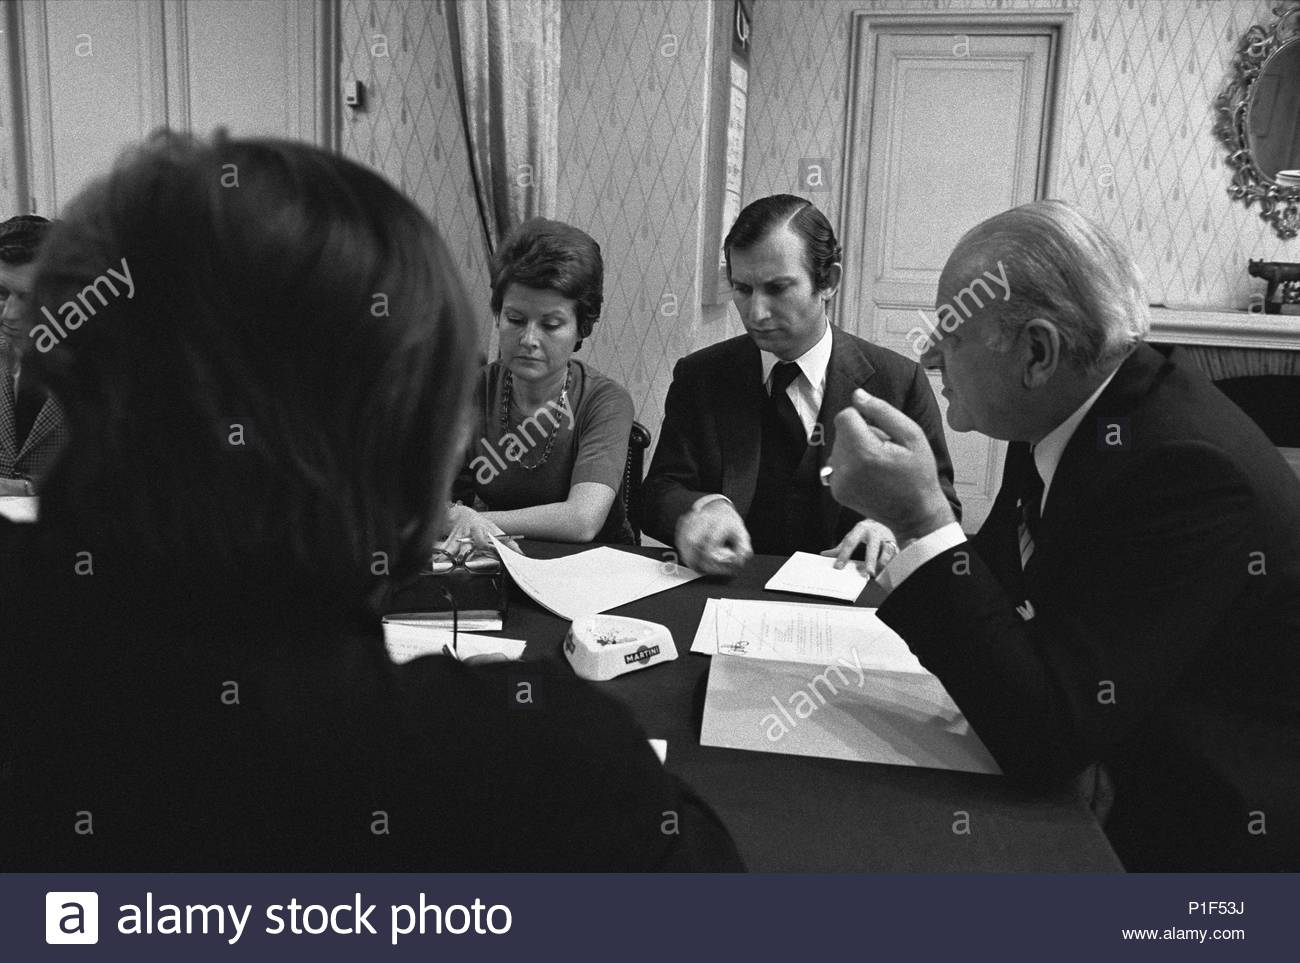 Composer Rolf Liebermann,director of the Paris Opera,   meeting with his staff. left of Liebermann is Hugue Gall,   his assistant. Location: Opera House Palais Garnier, Paris, France. - Stock Image